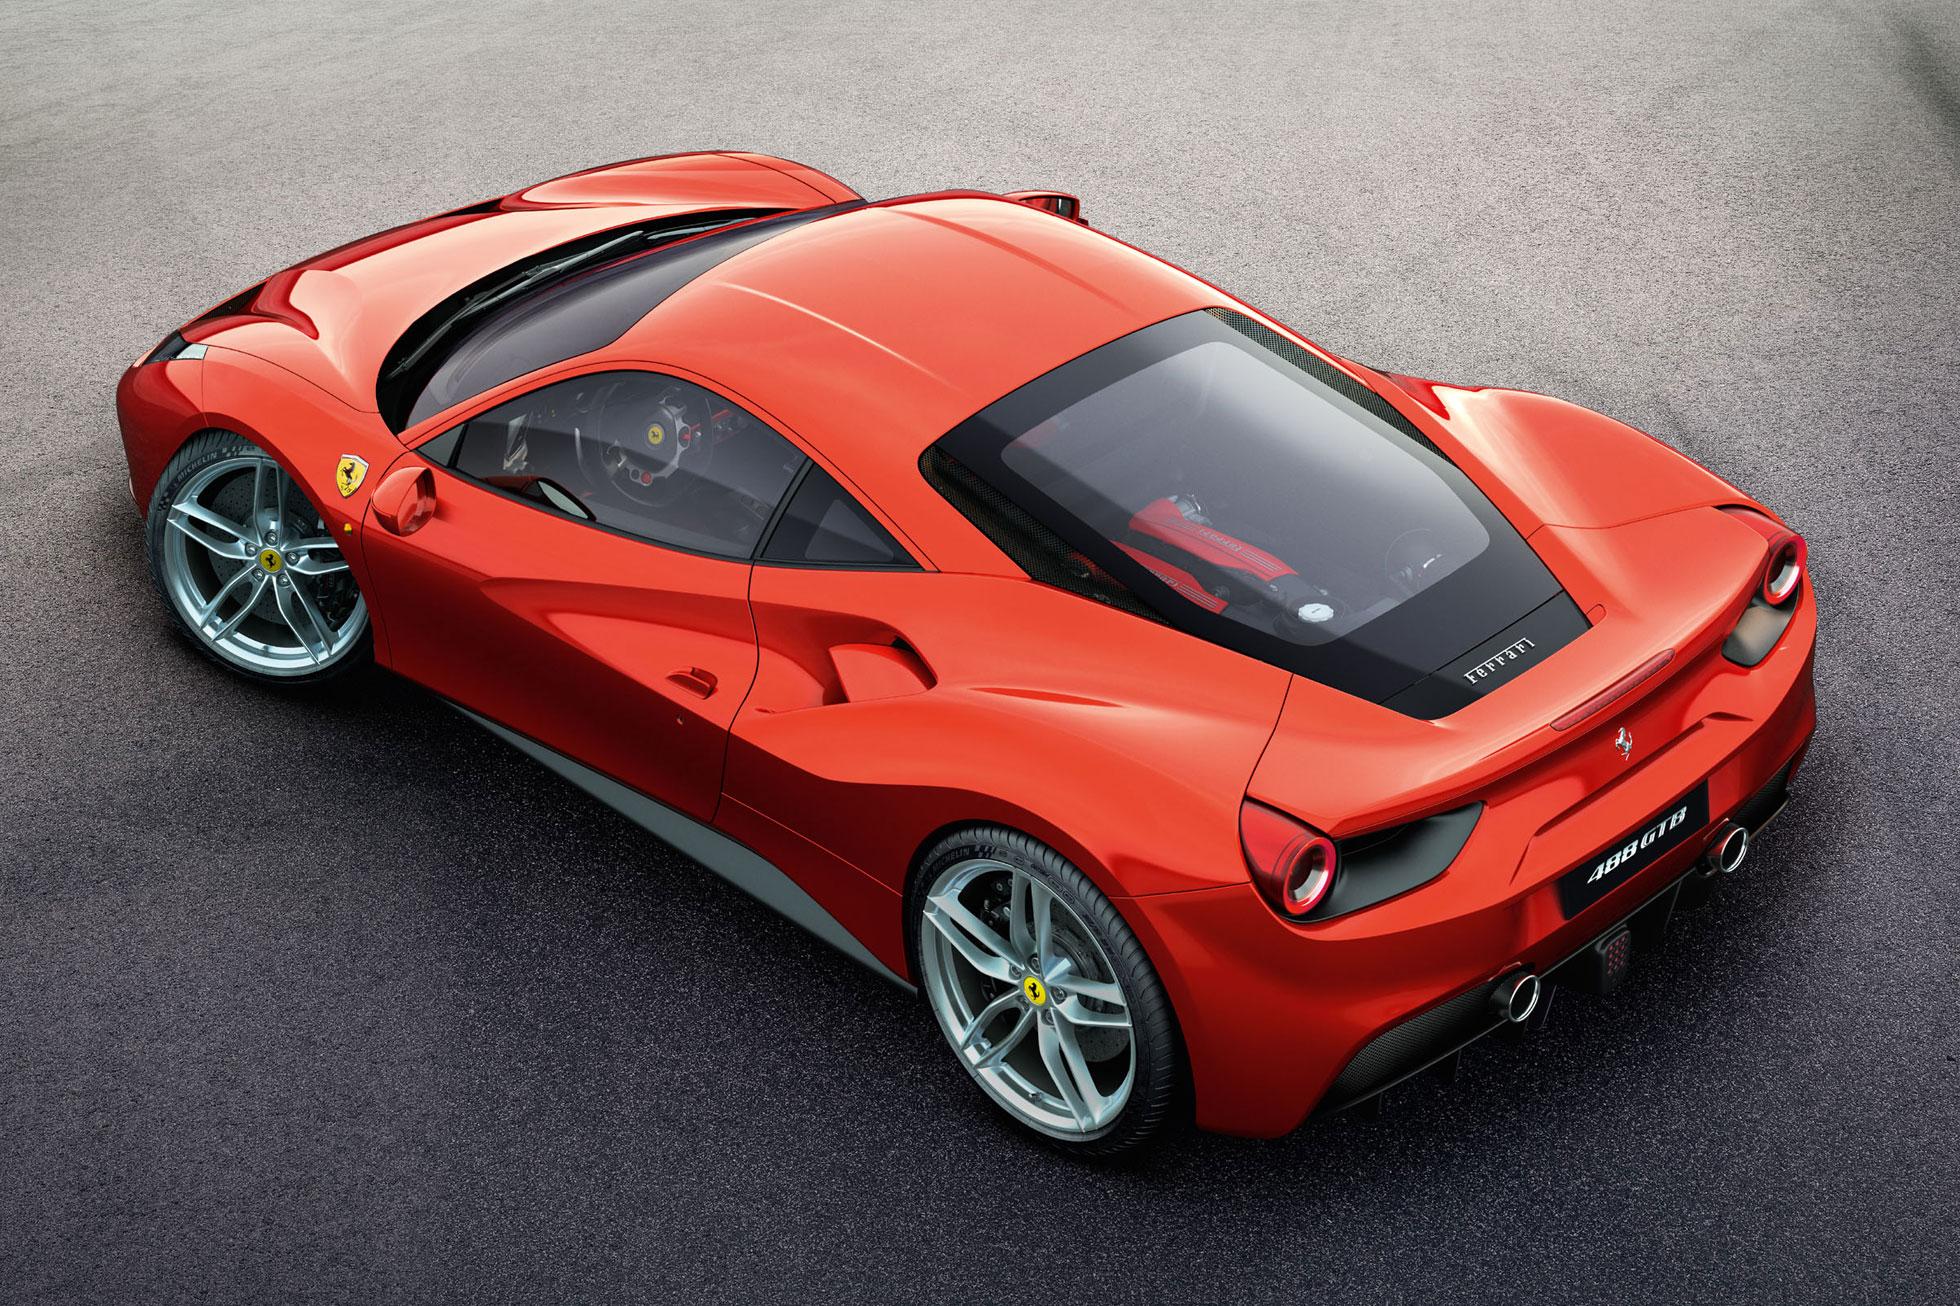 Ferrari reveals turbocharged 488 GTB ahead of Geneva Motor Show debut